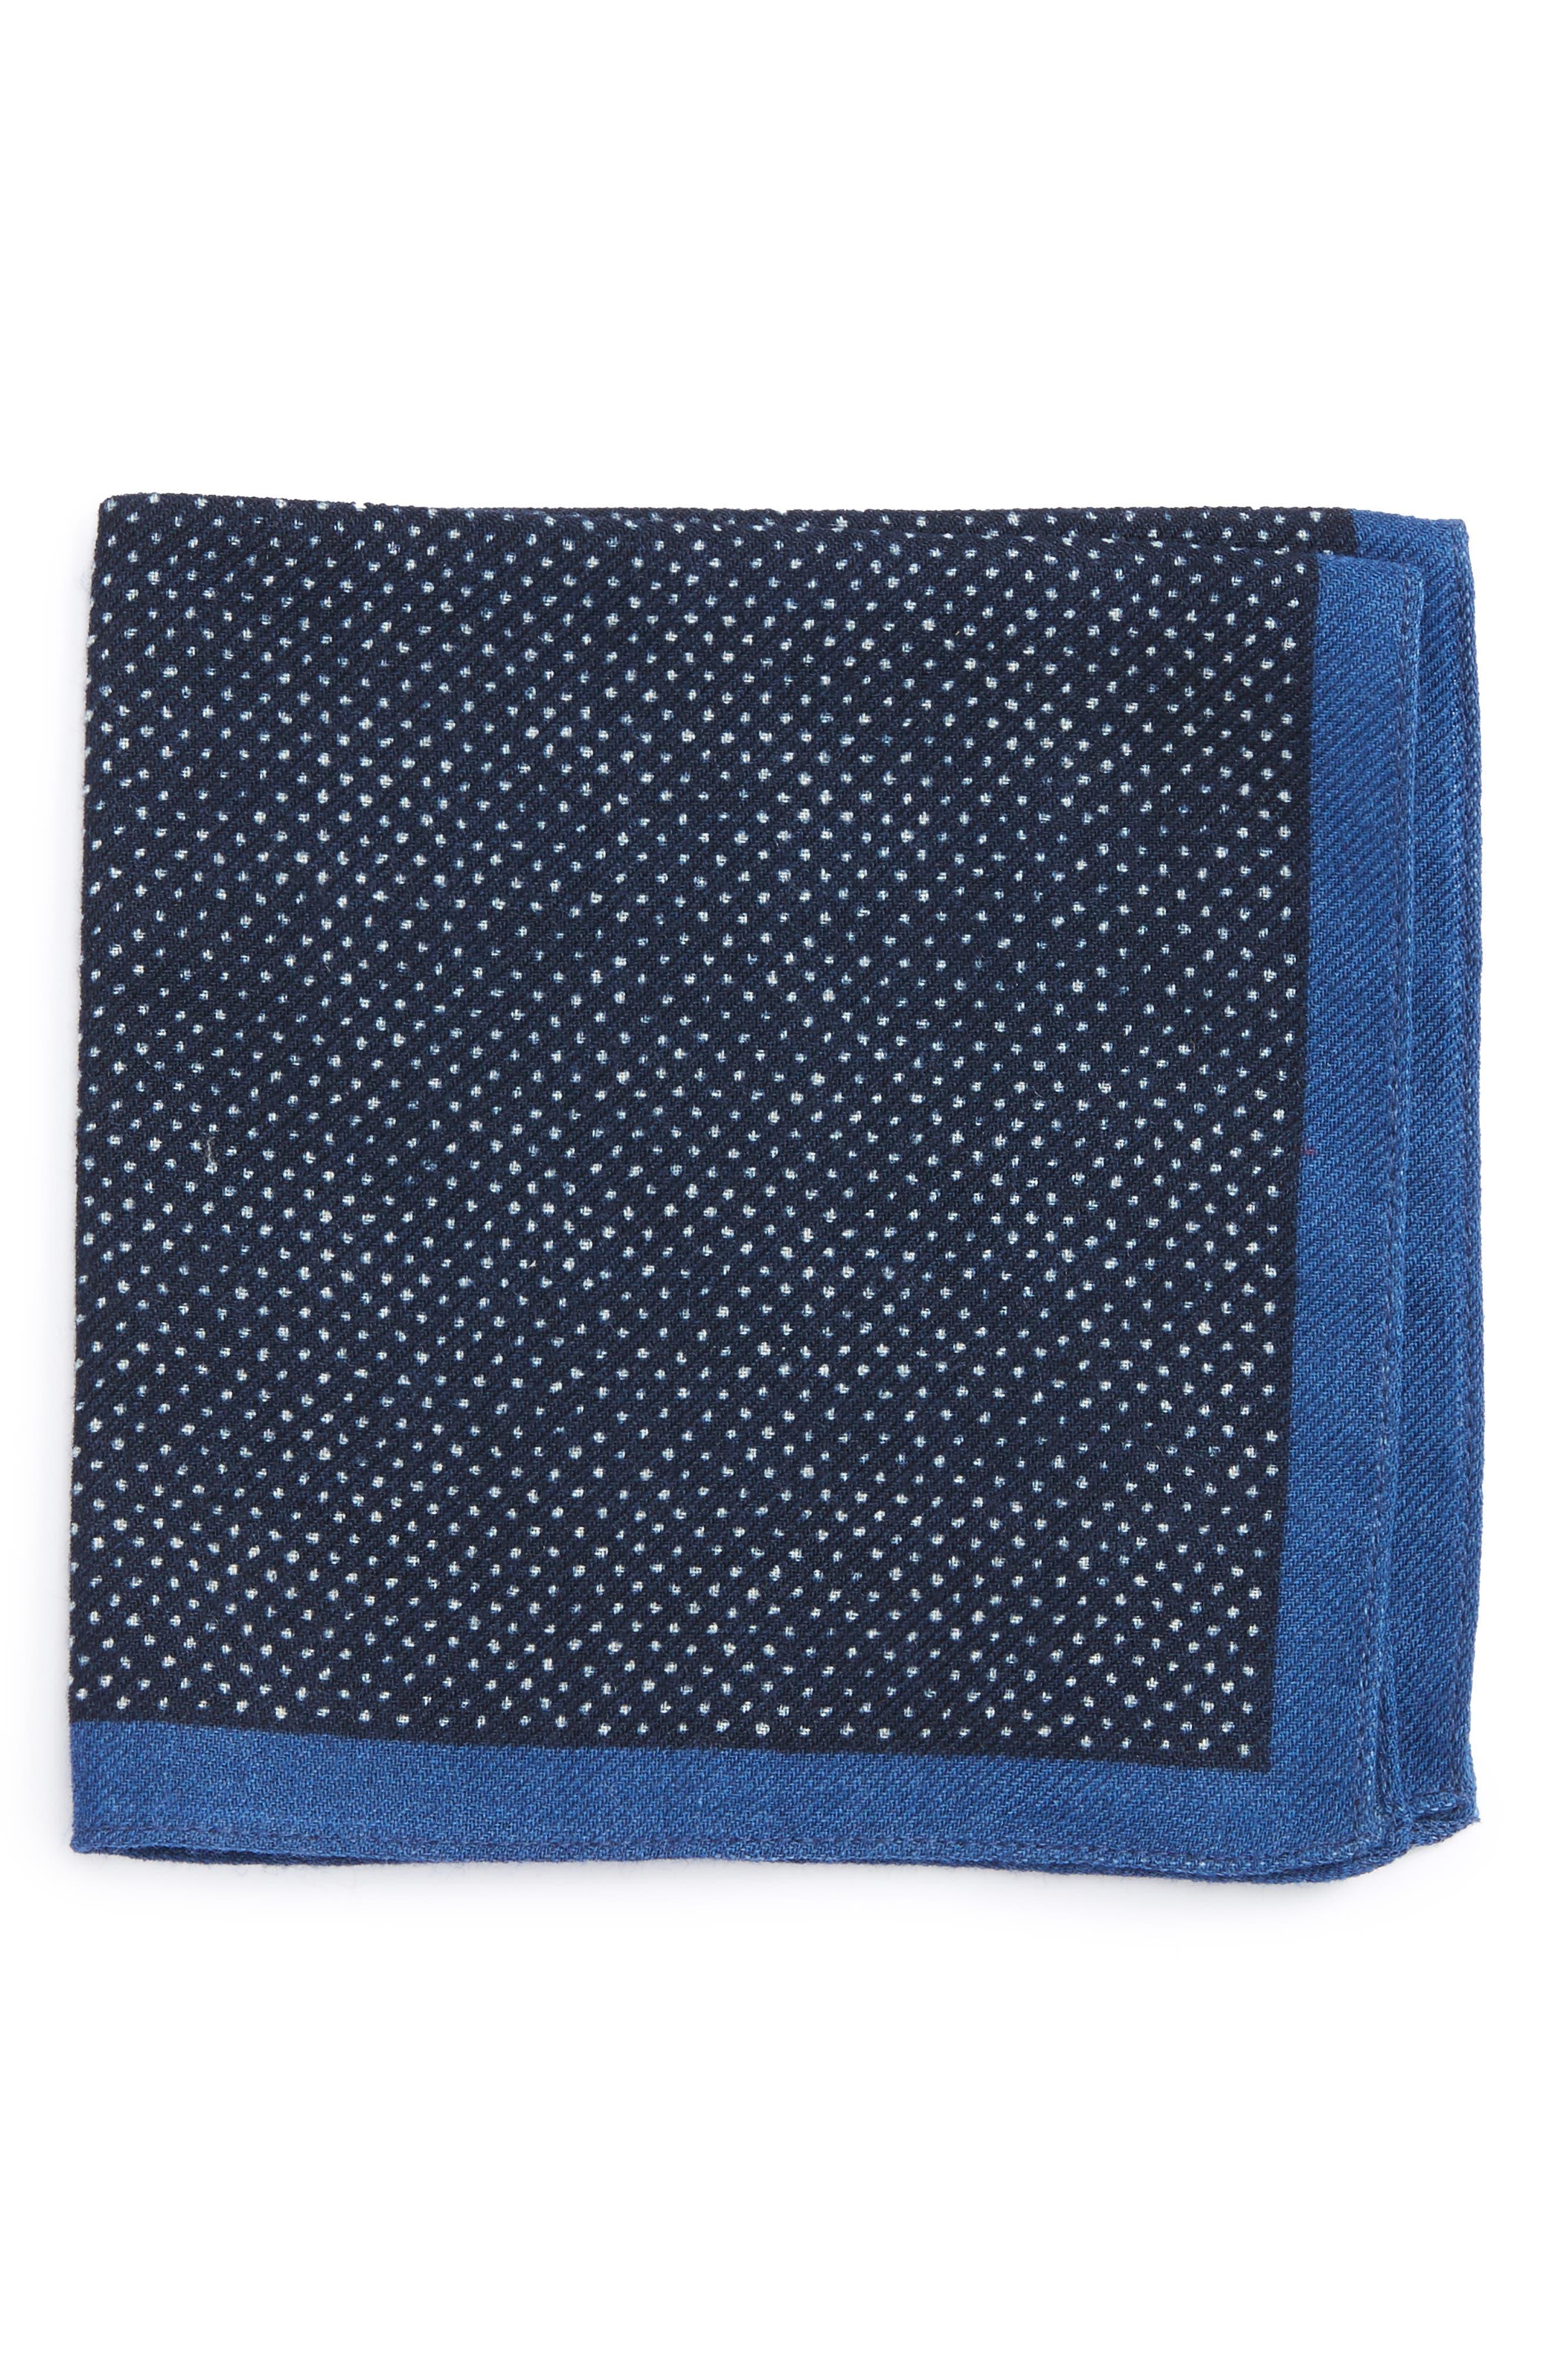 Dot Wool Pocket Square,                         Main,                         color,